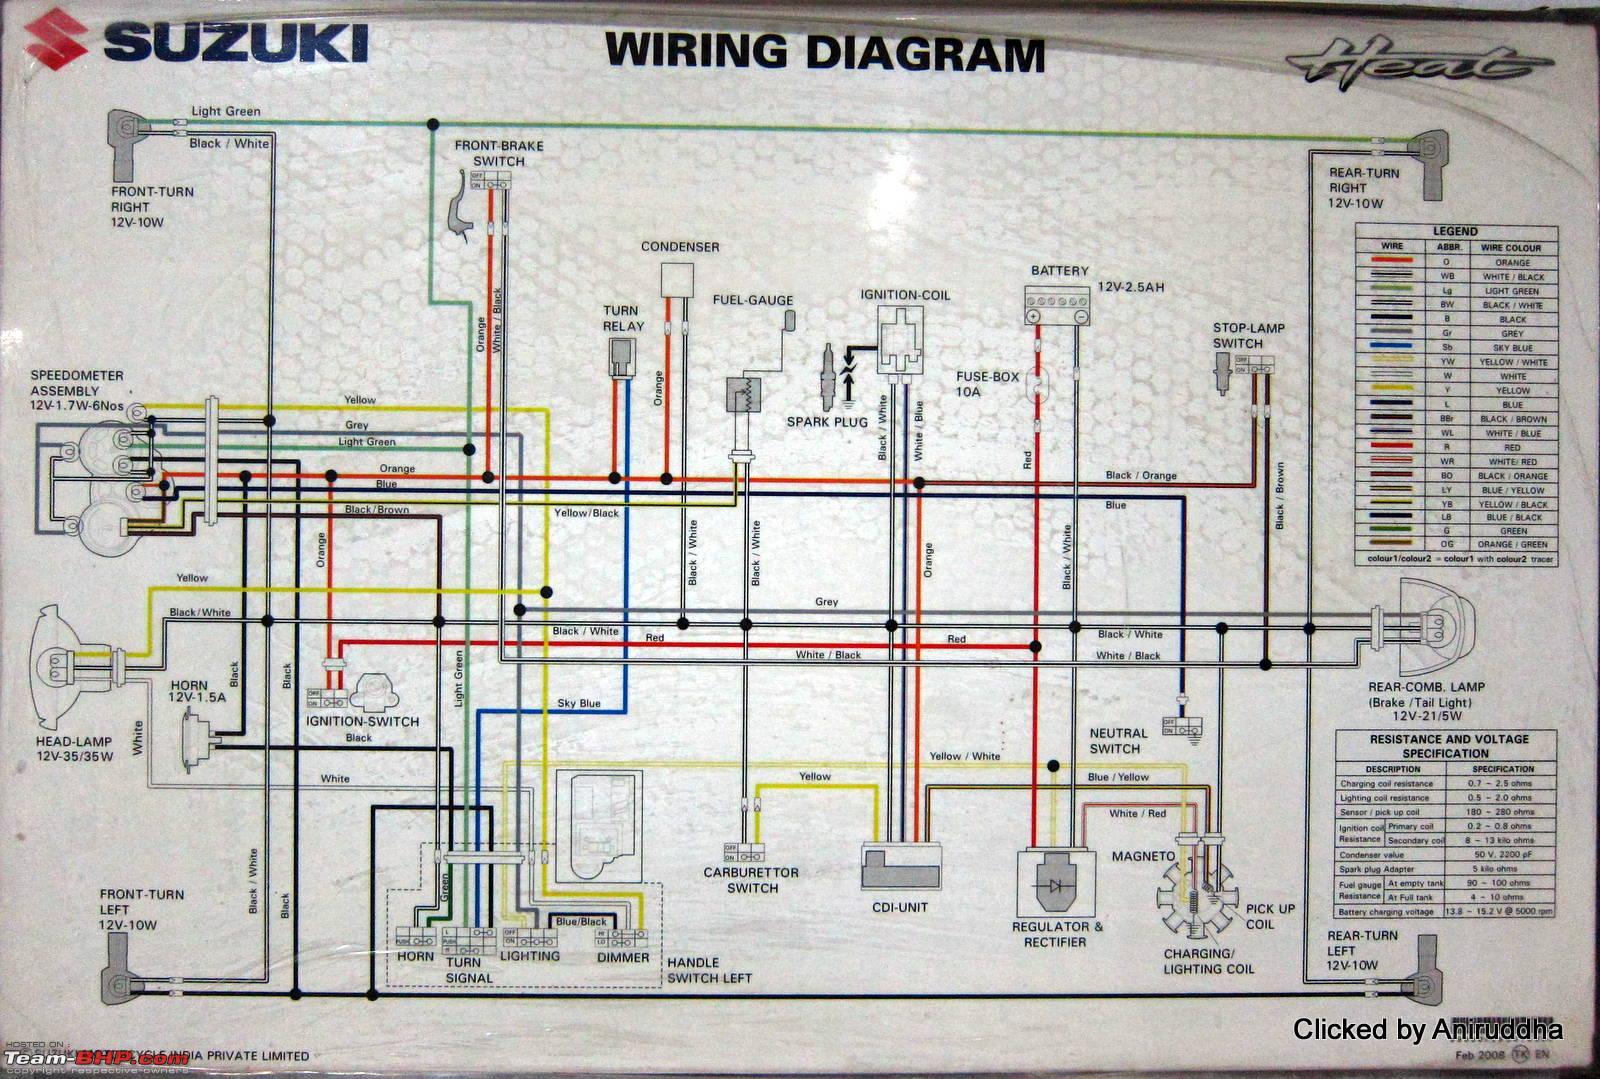 V92c Victory Wiring Diagram Diagrams Honda Valkyrie 1999 2003